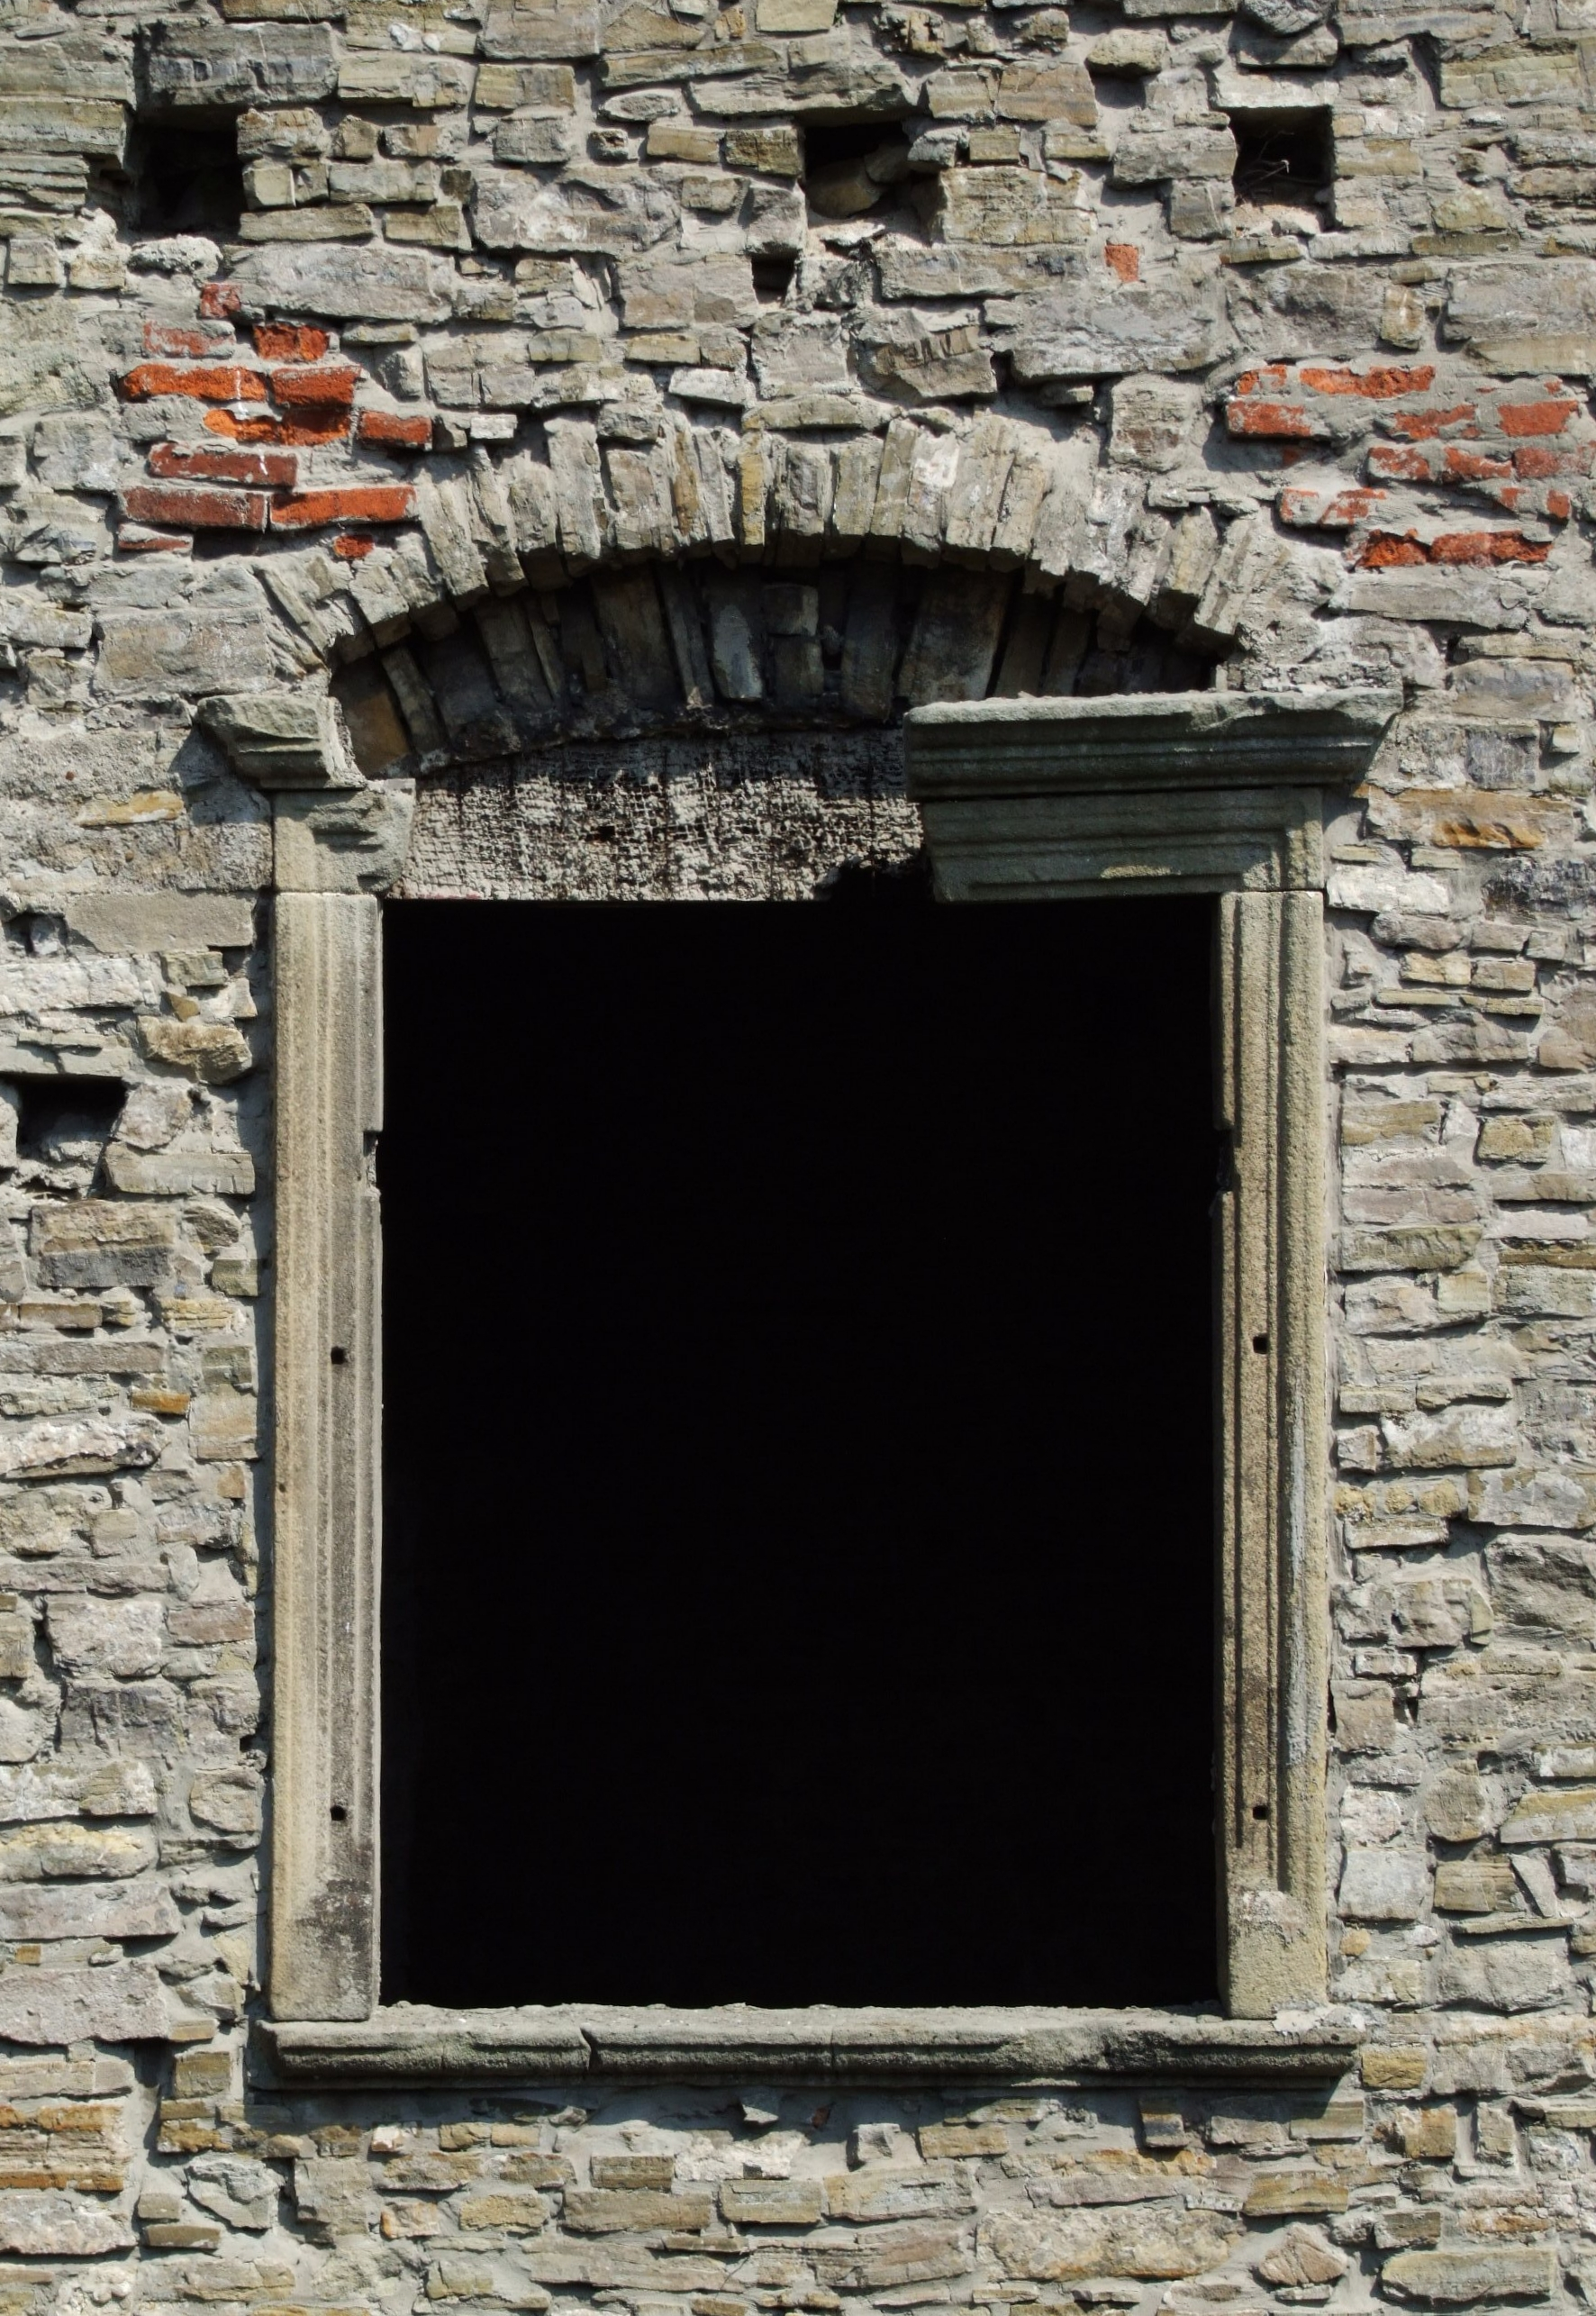 File:Hukvaldy castle - window.jpg - Wikimedia Commons